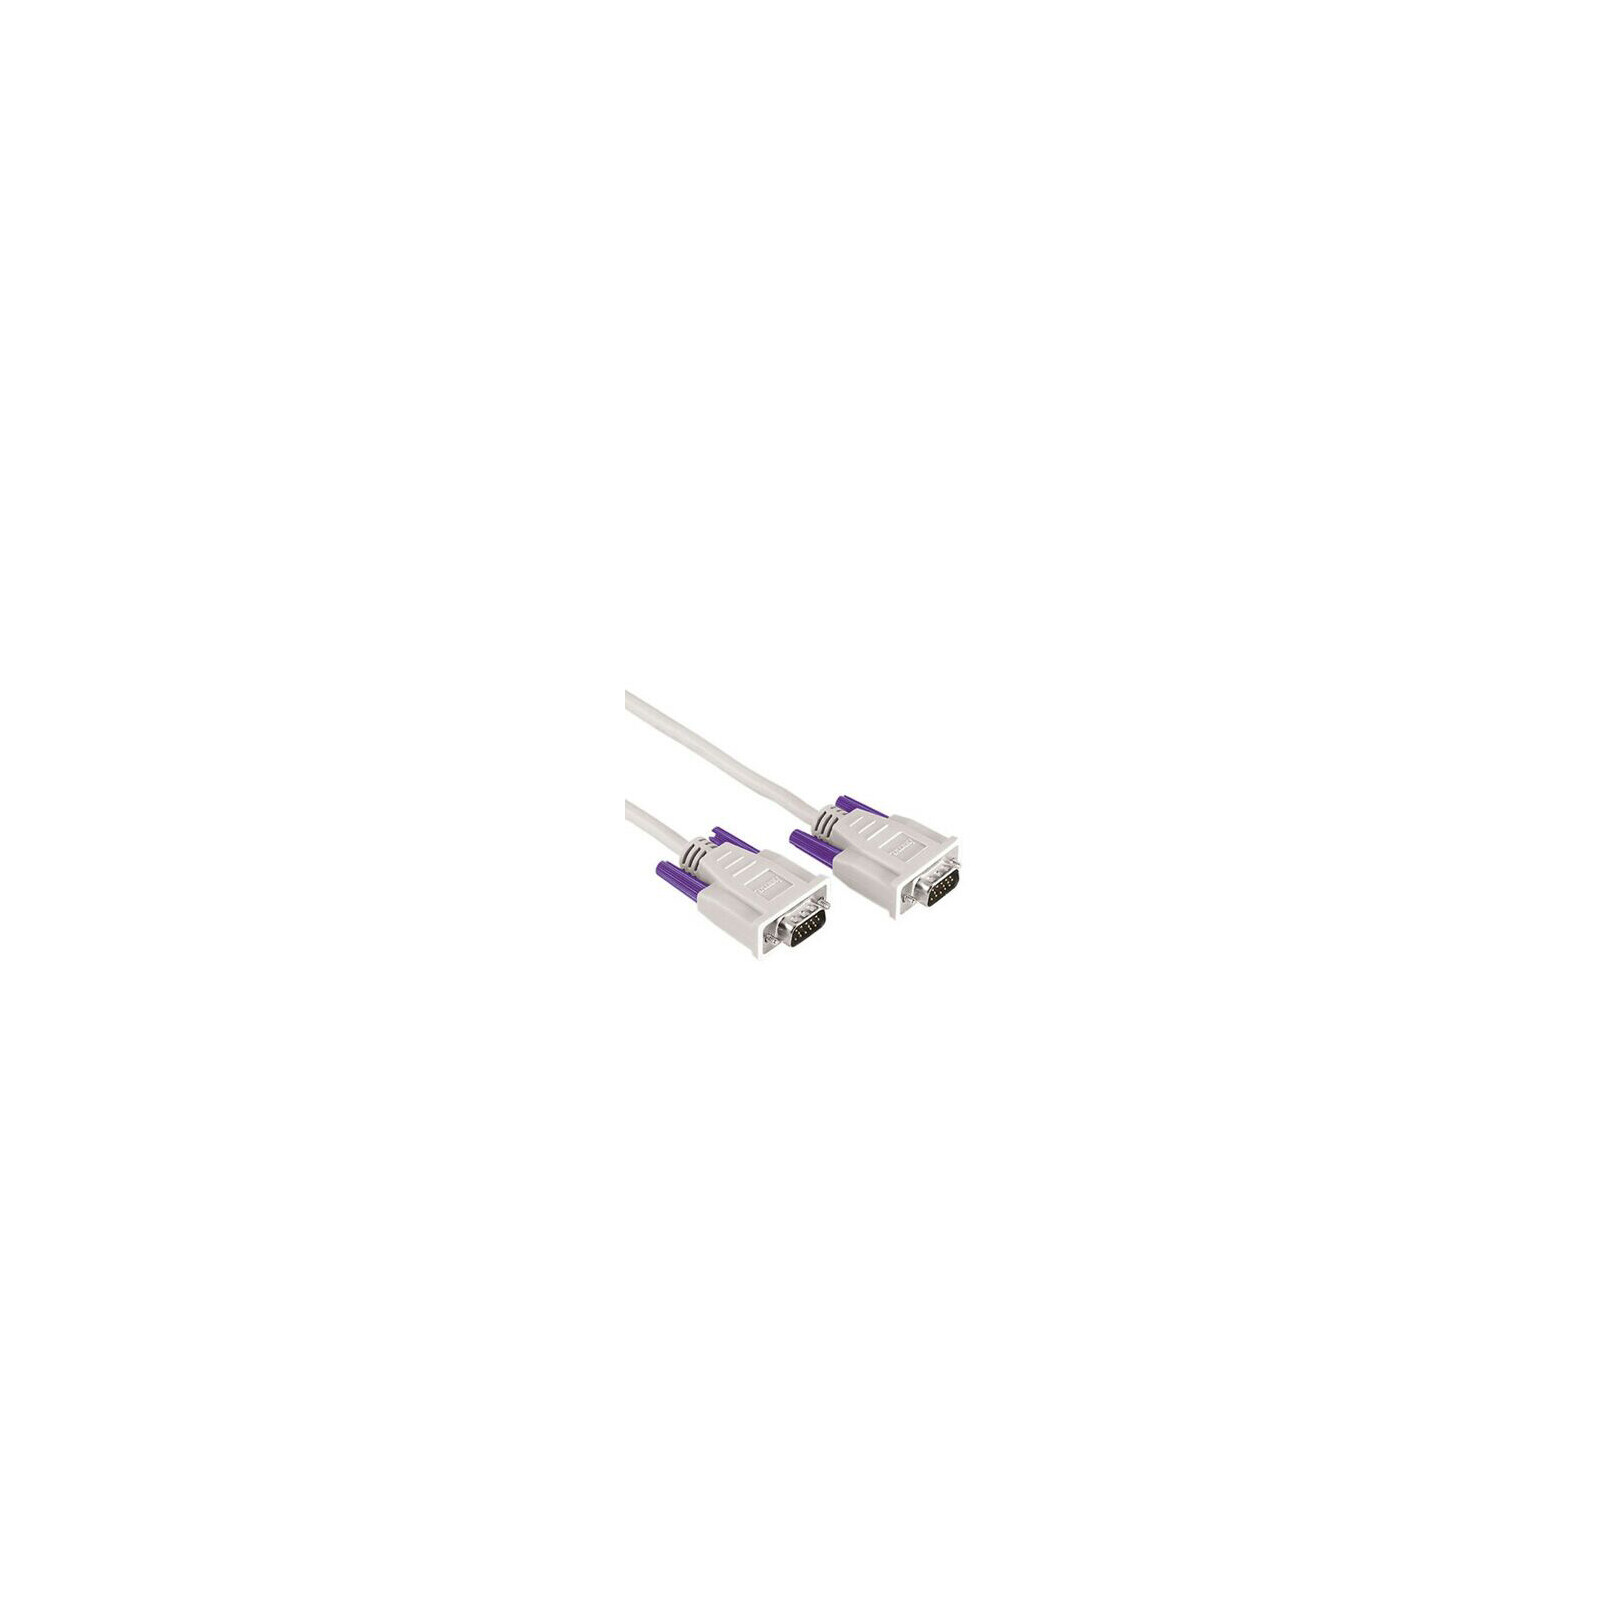 Hama 42092 VGA-Kabel, geschirmt, 5,00 m